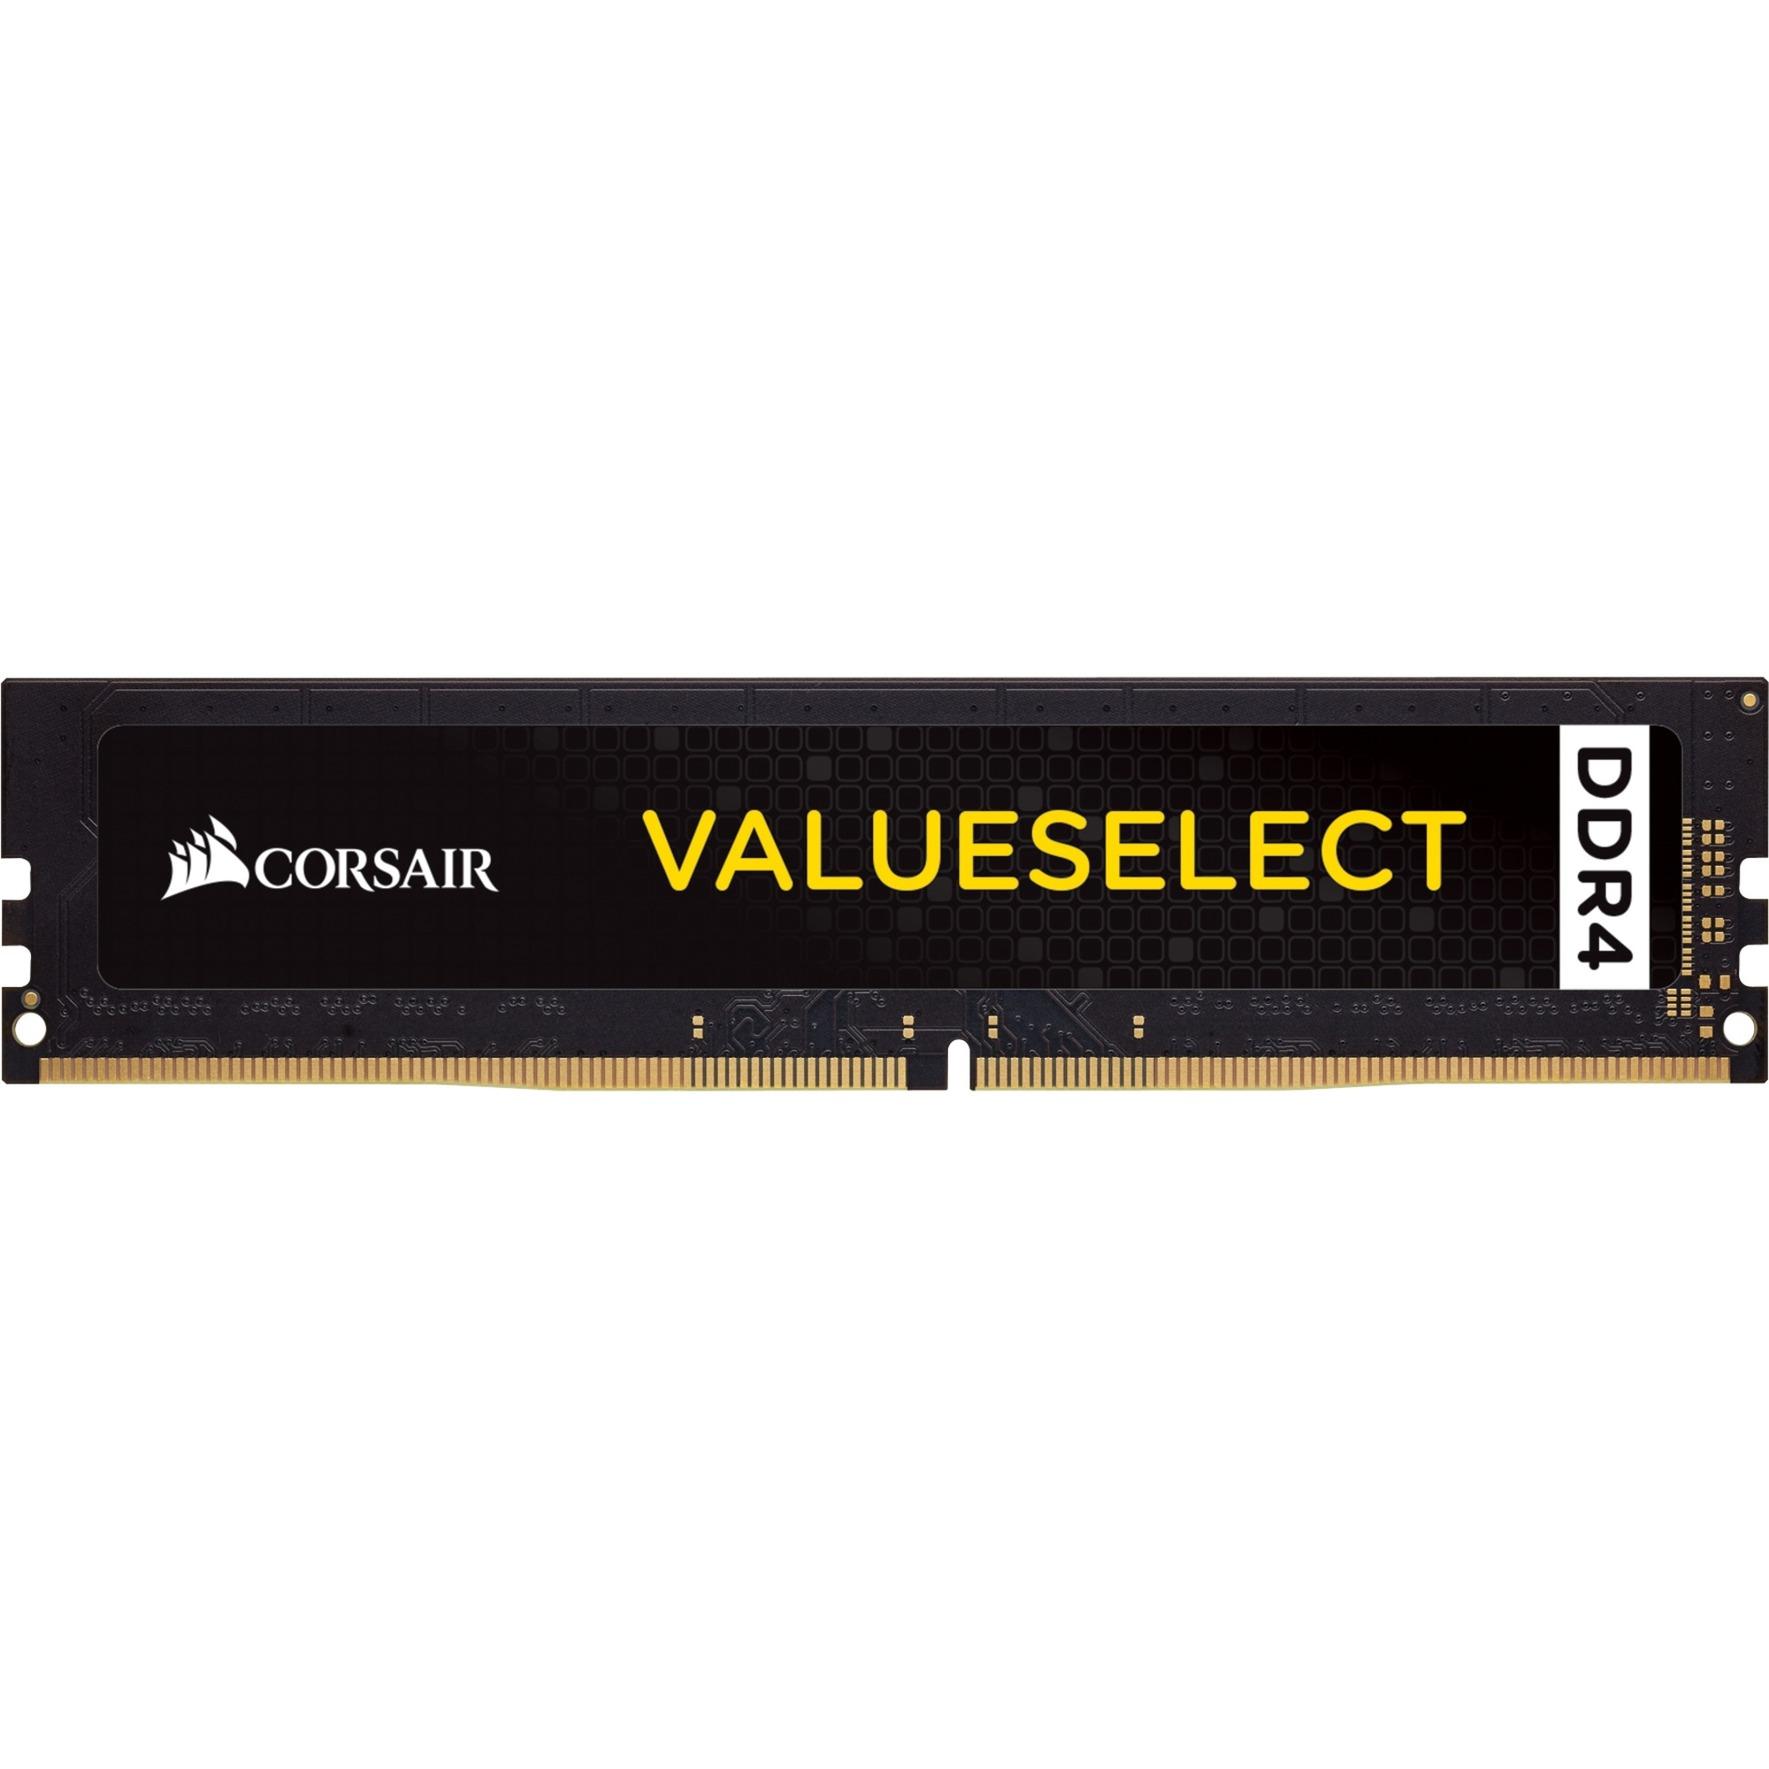 ValueSelect 16GB, DDR4, 2400MHz módulo de memoria, Memoria RAM